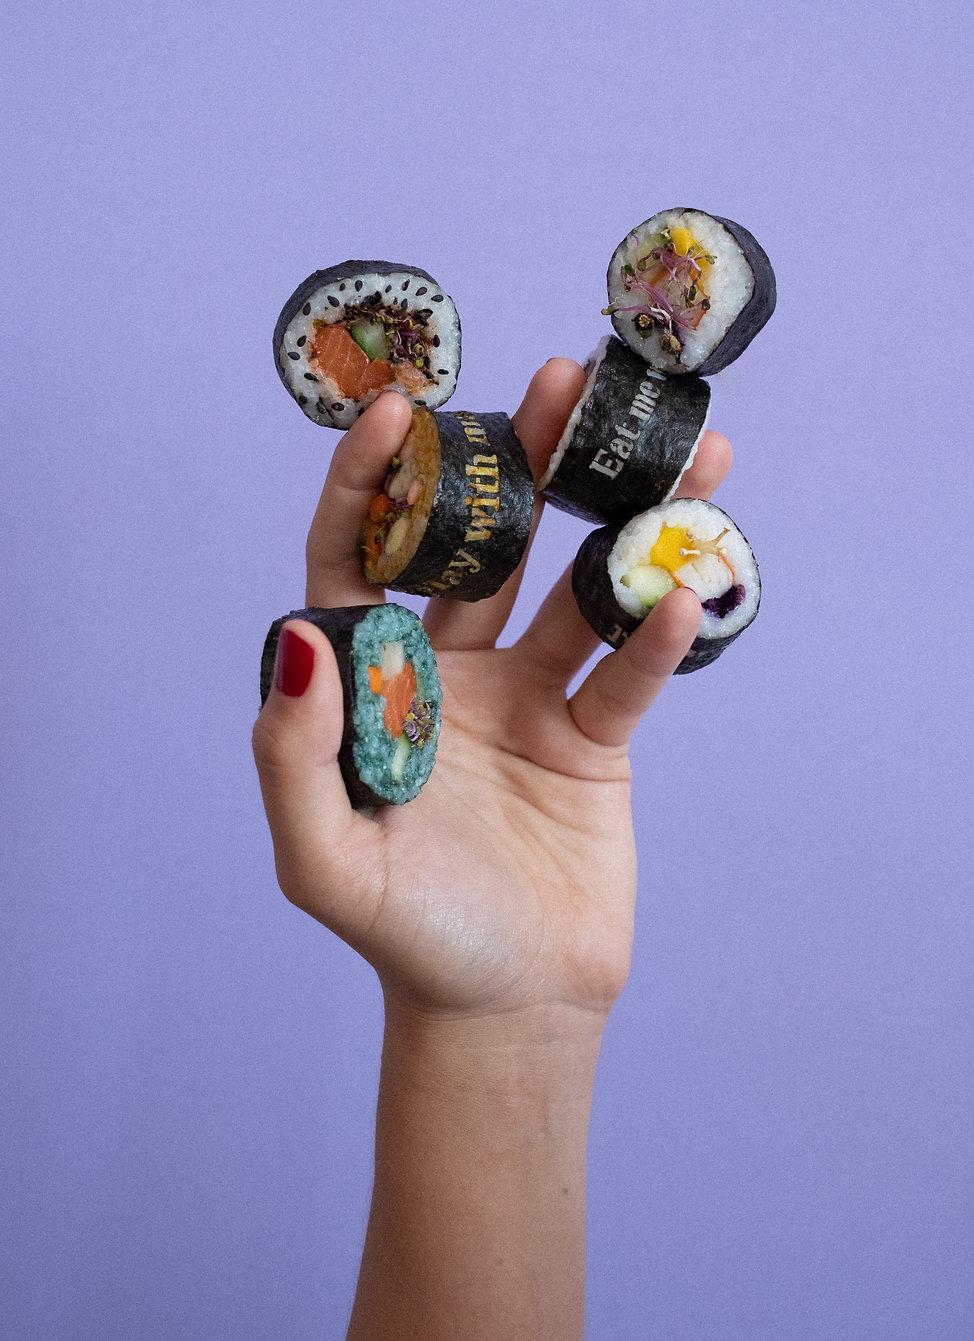 Nicole Vindel - Food Design & Art - Playful Nori